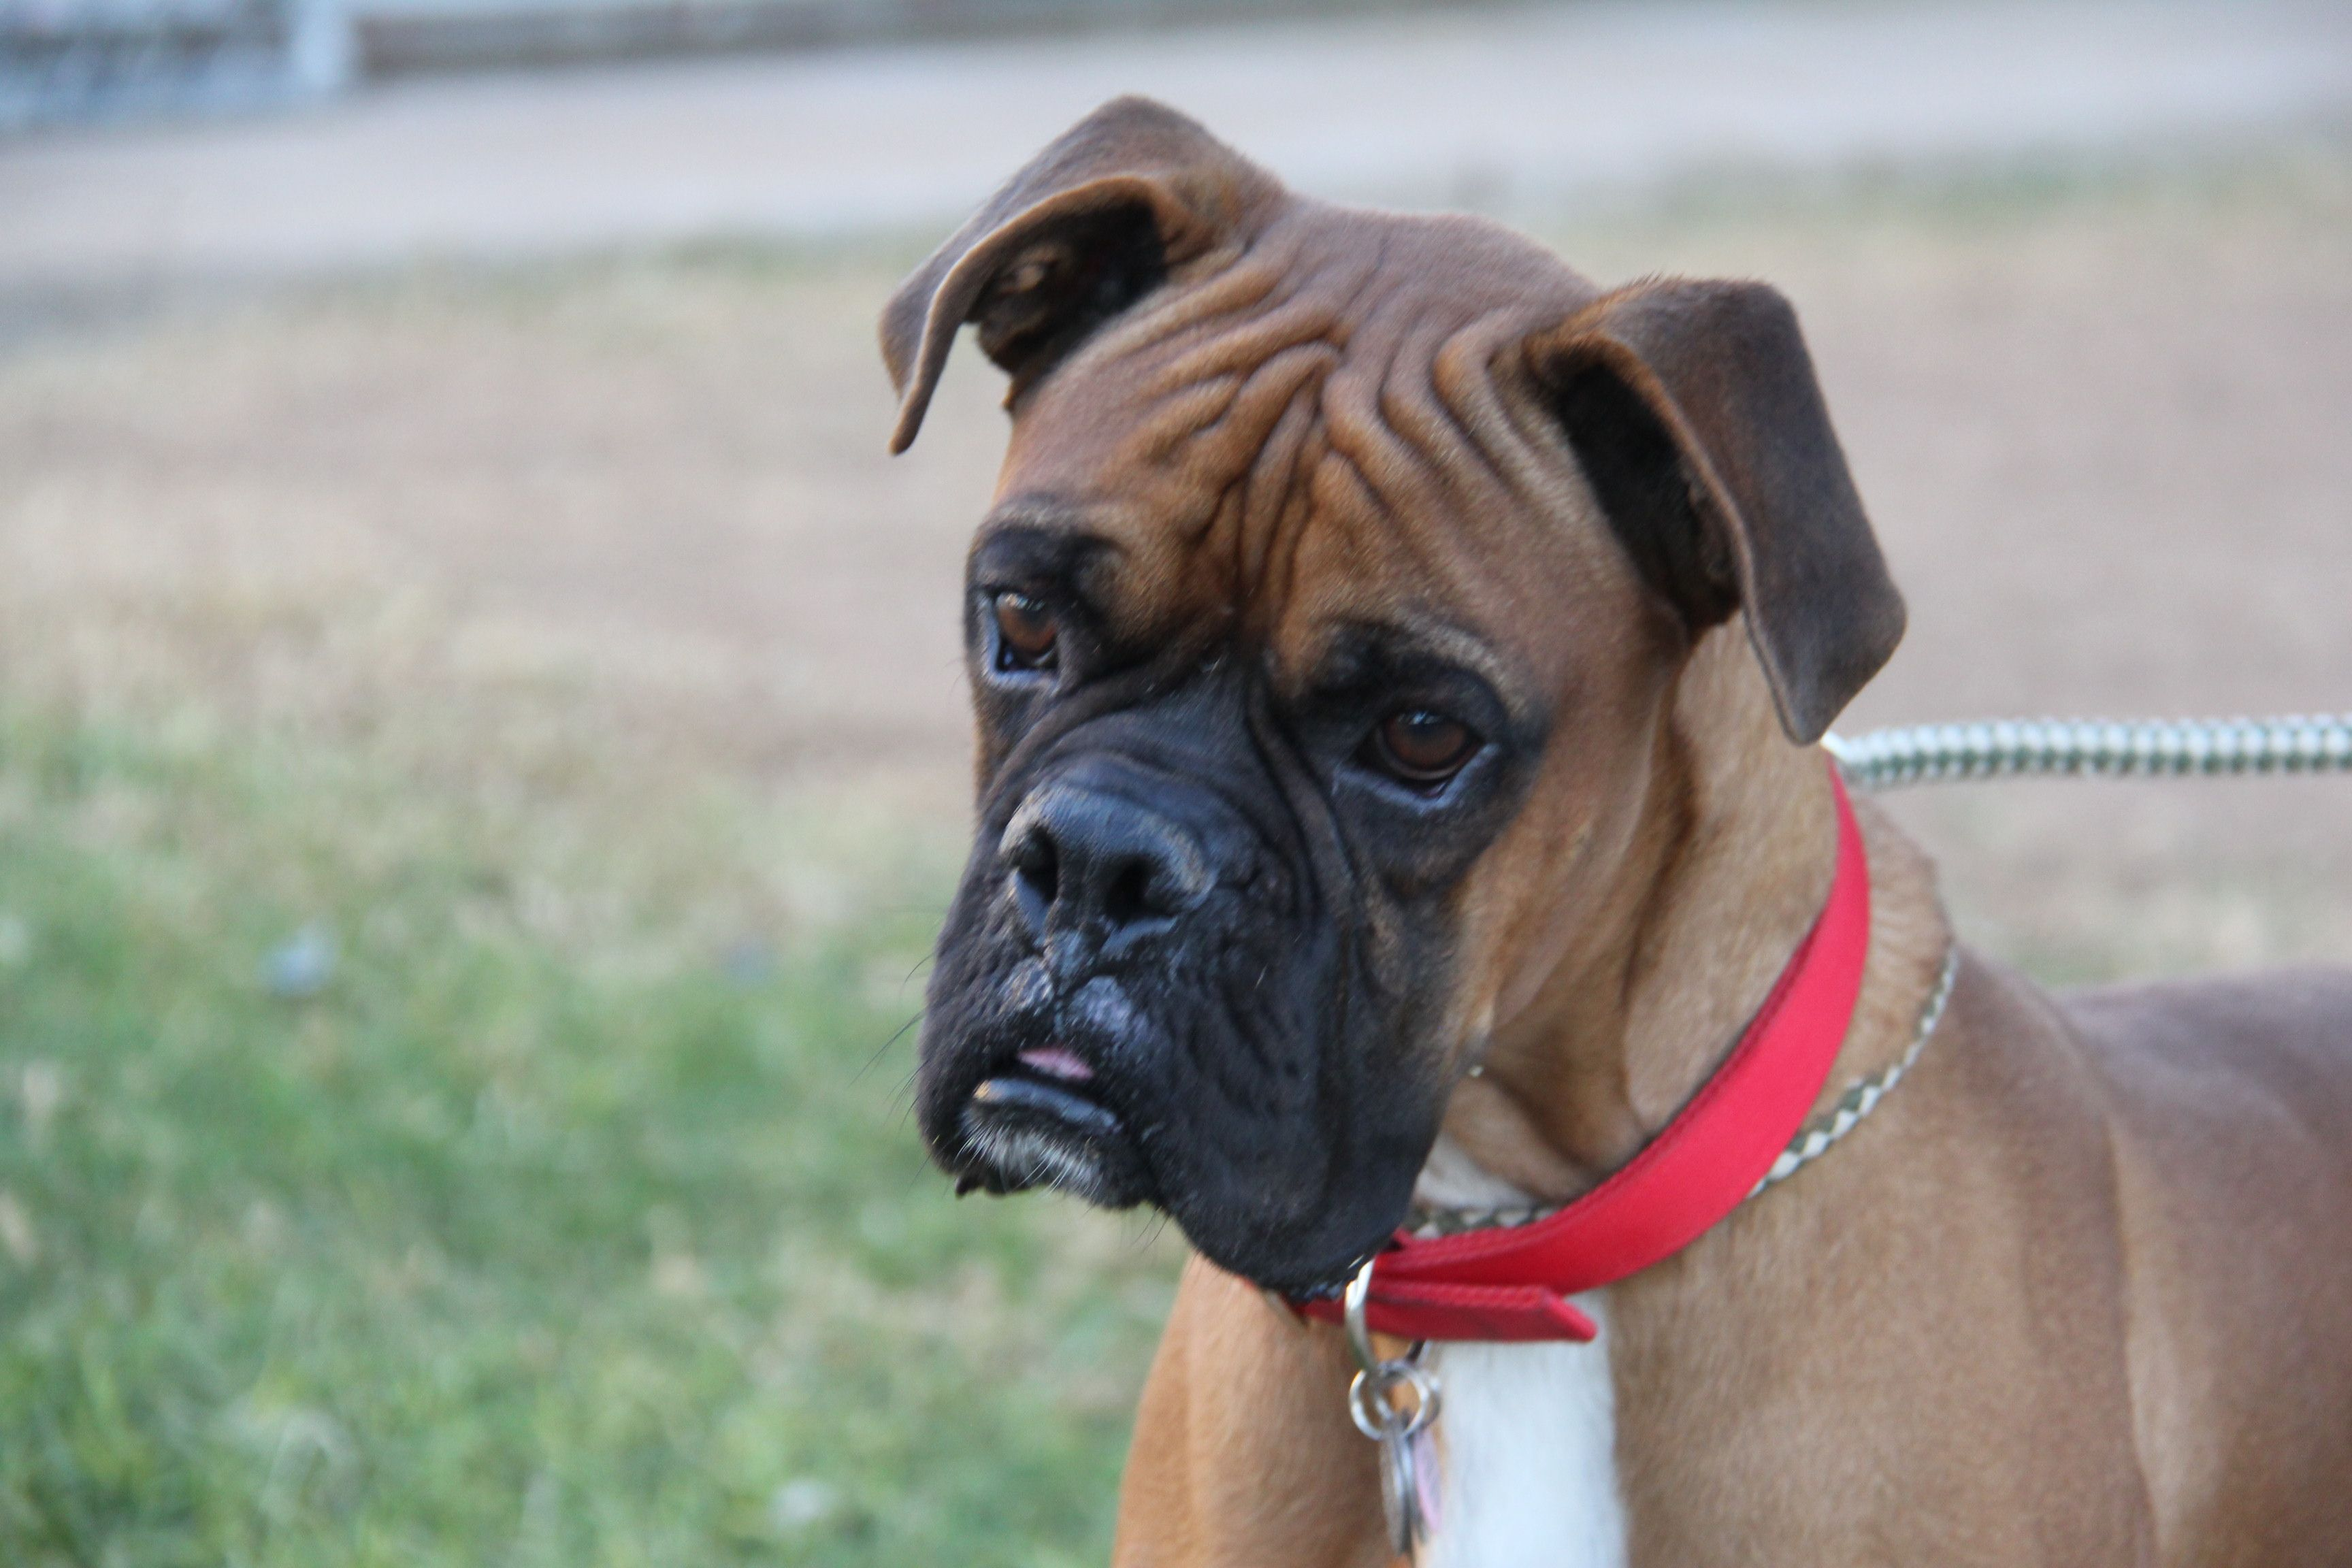 Boxer Dog For Adoption In Phoenix Az Adn 818046 On Puppyfinder Com Gender Male Age Adult Boxer Dogs Dog Adoption Boxer